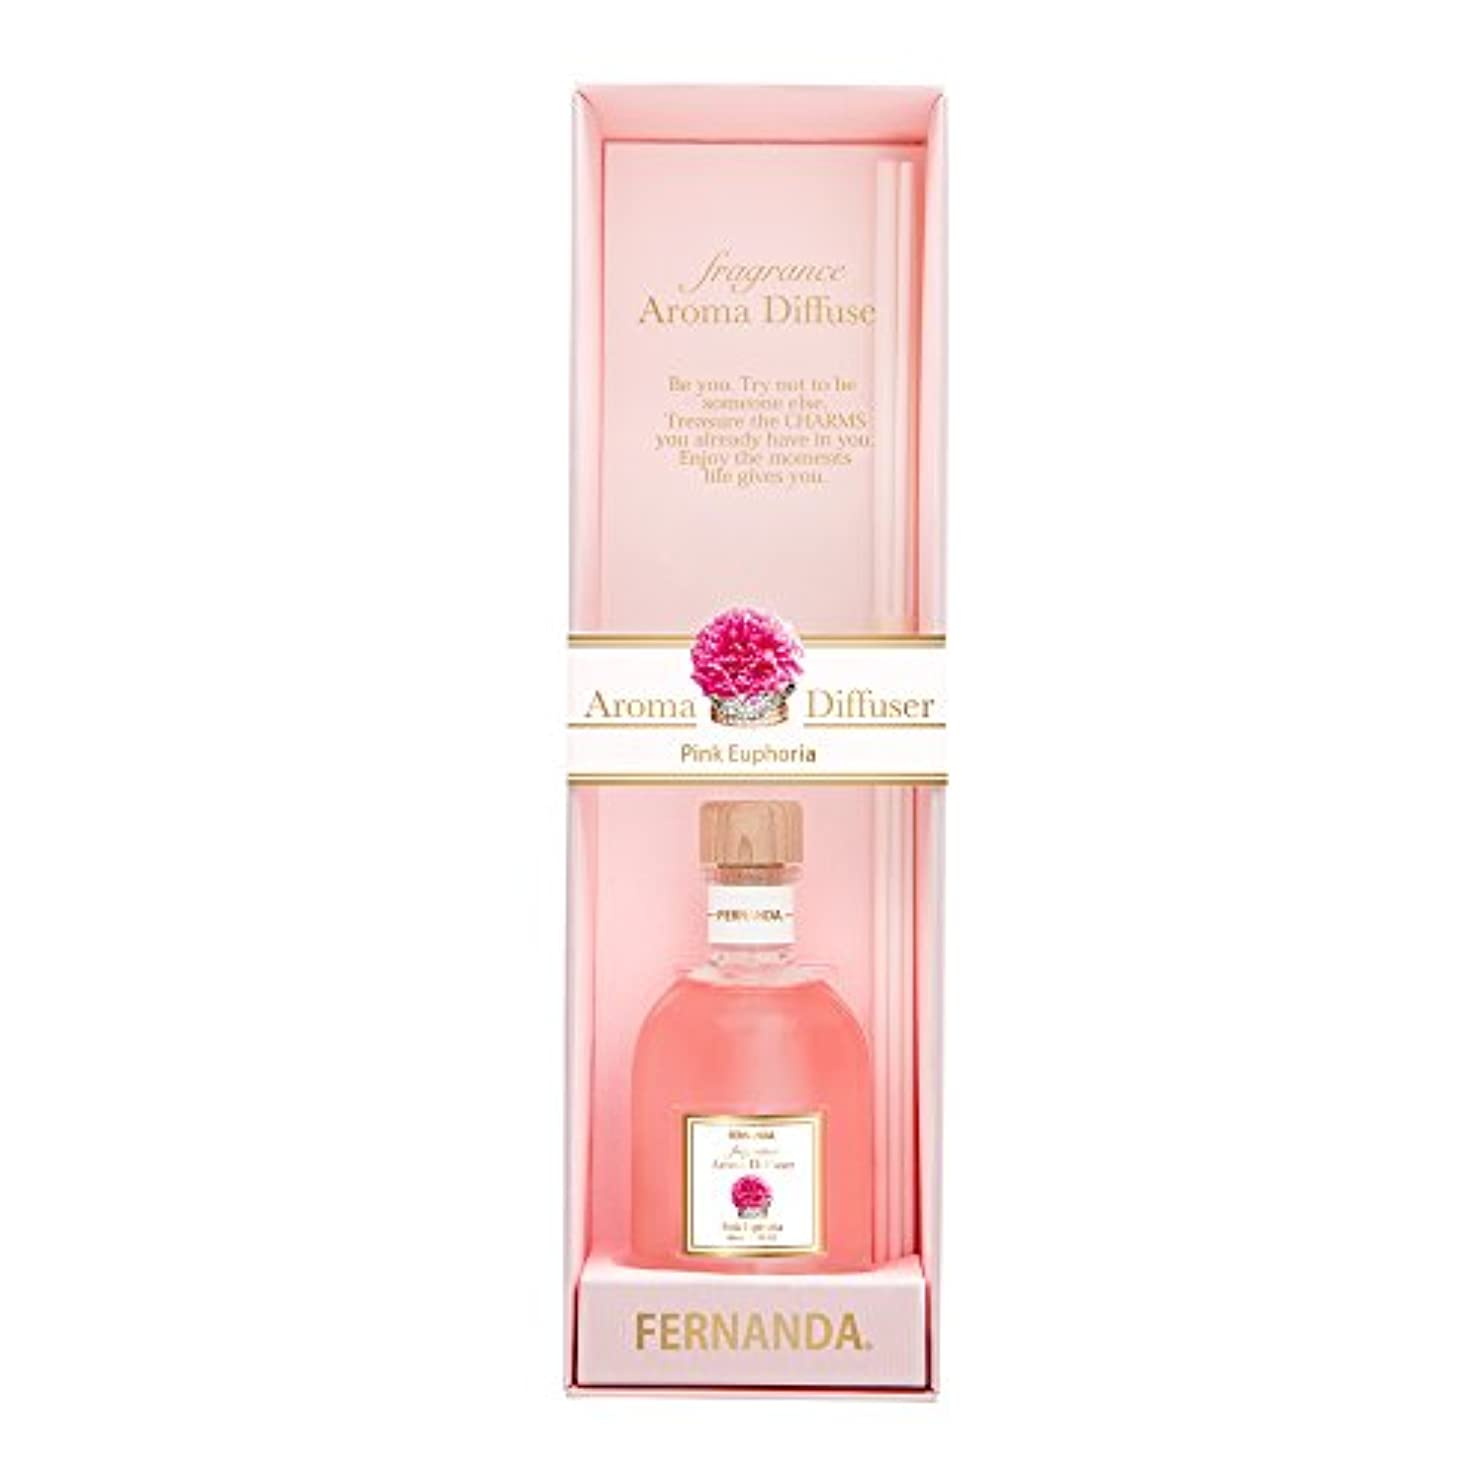 FERNANDA(フェルナンダ) Fragrance Aroma Diffuser Pink Euphoria (アロマディフューザー ピンクエウフォリア)